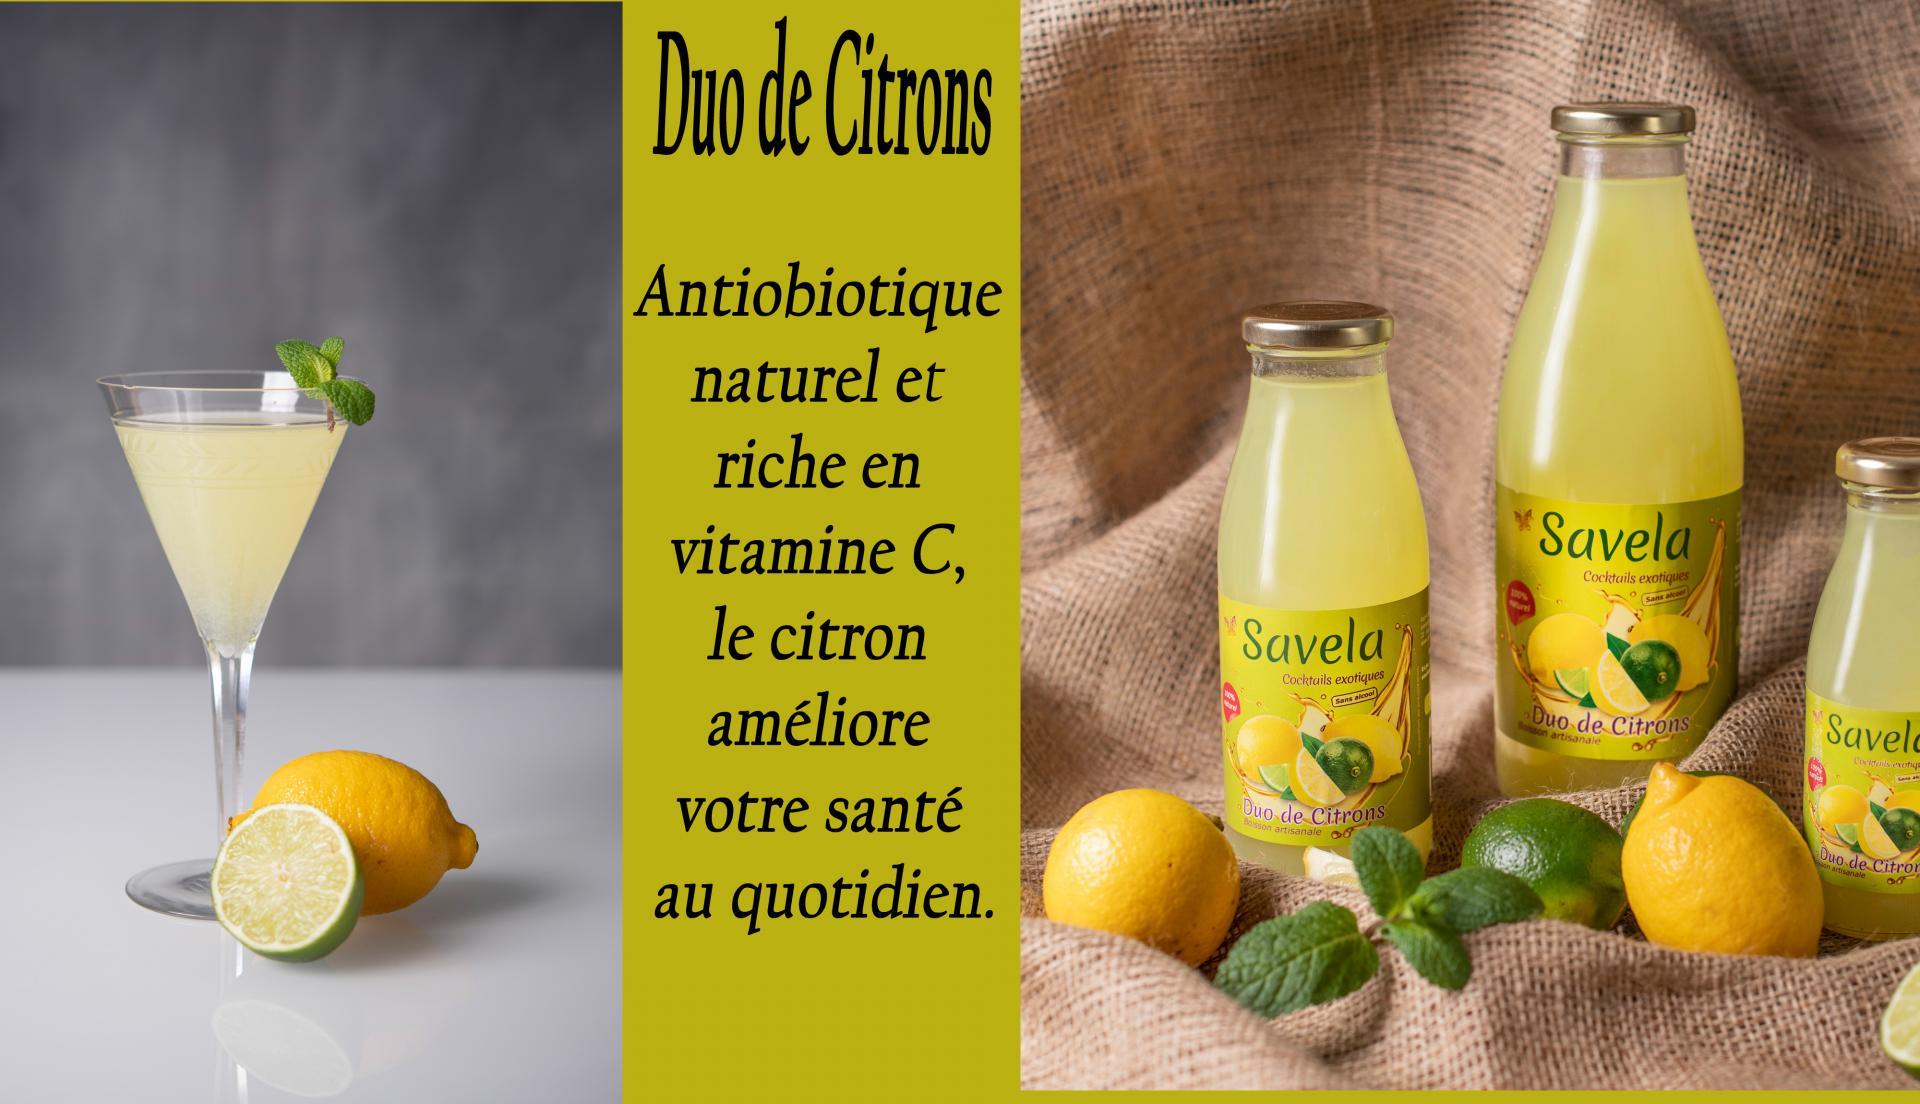 Slider 3 duo de citrons v1